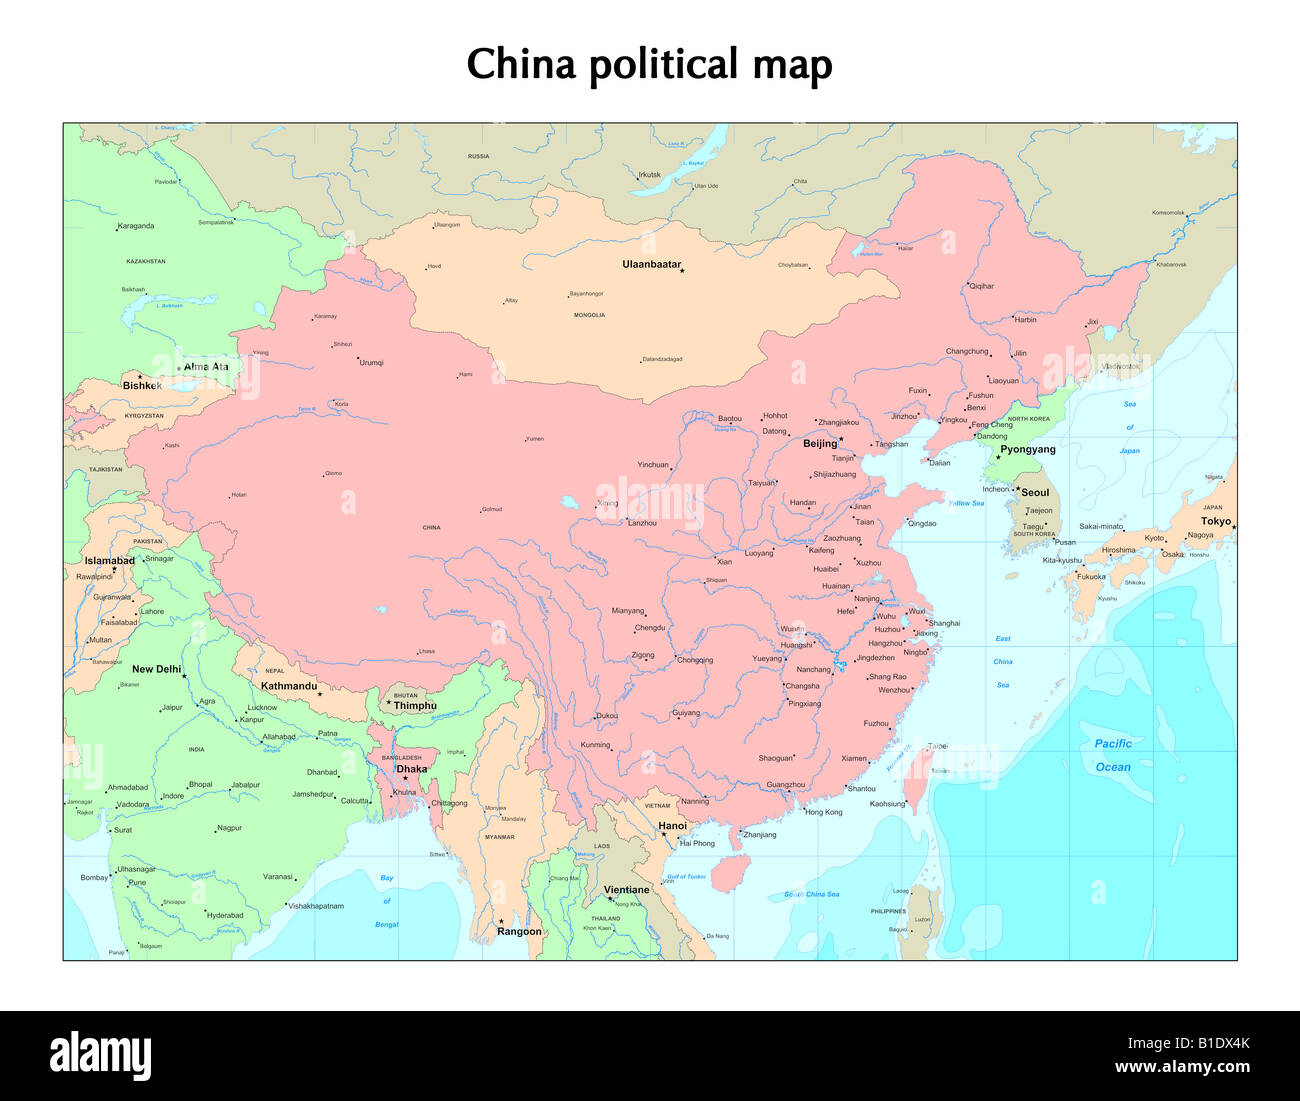 China Political Map Stock Photo 18130915 Alamy